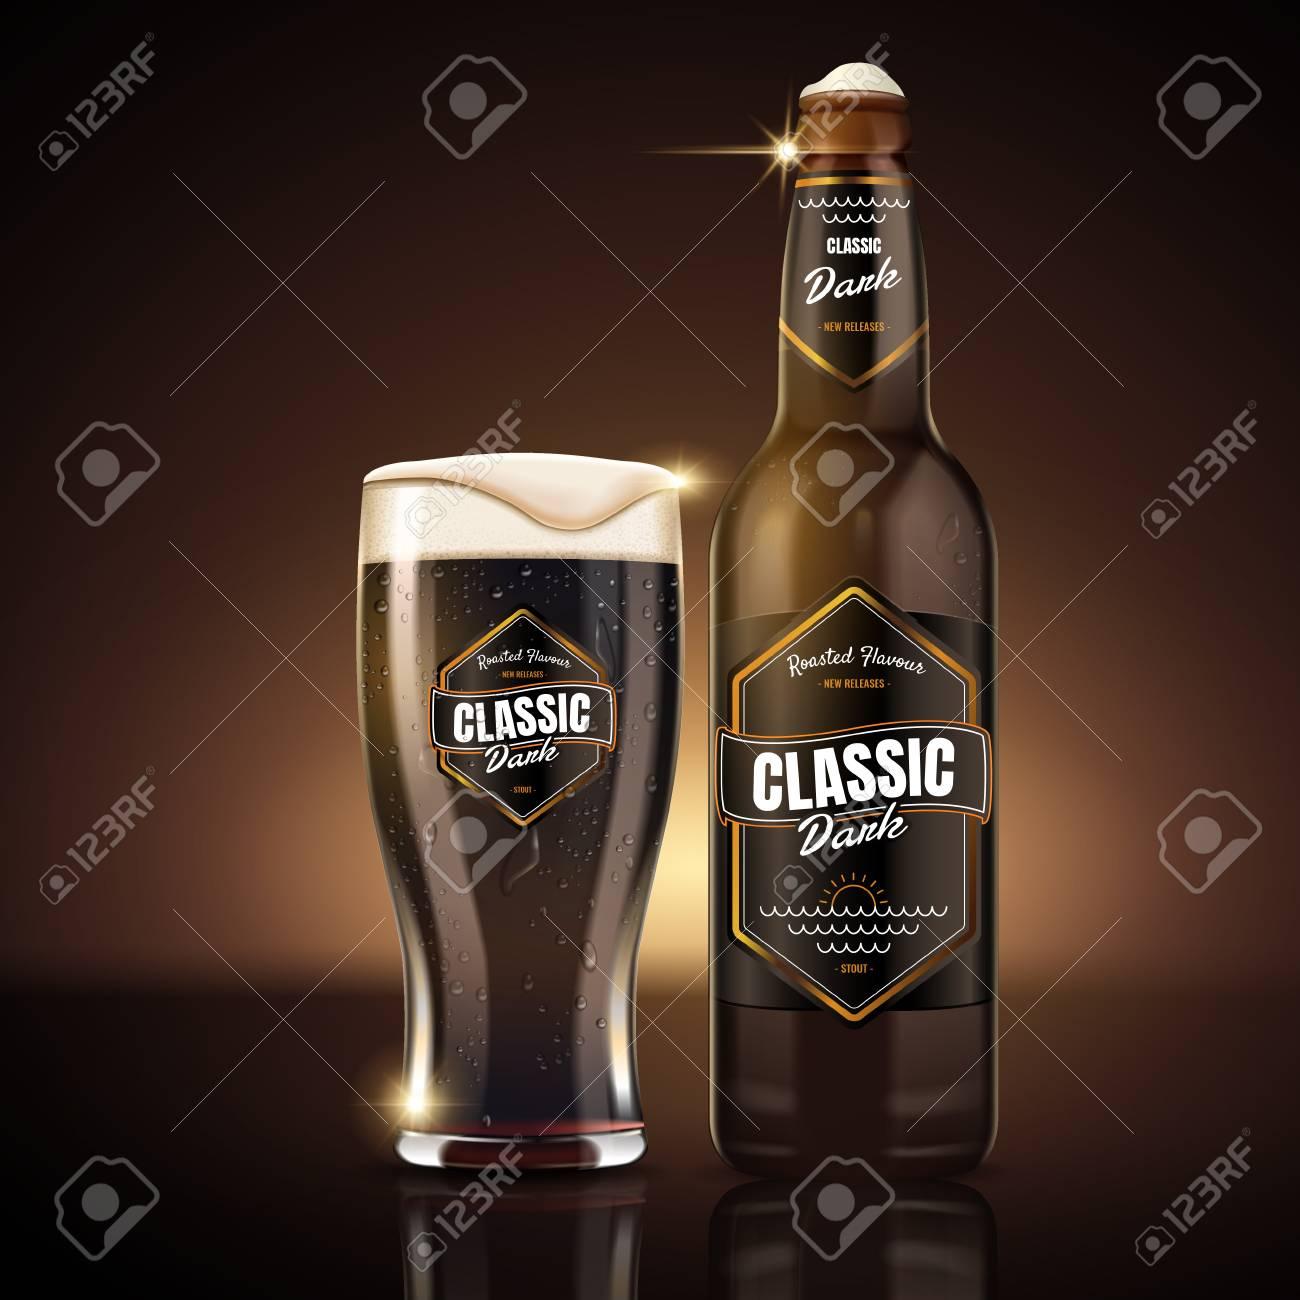 Classic dark beer package design, attractive classic dark beer in glass bottle with label design, 3d illustration - 83369314